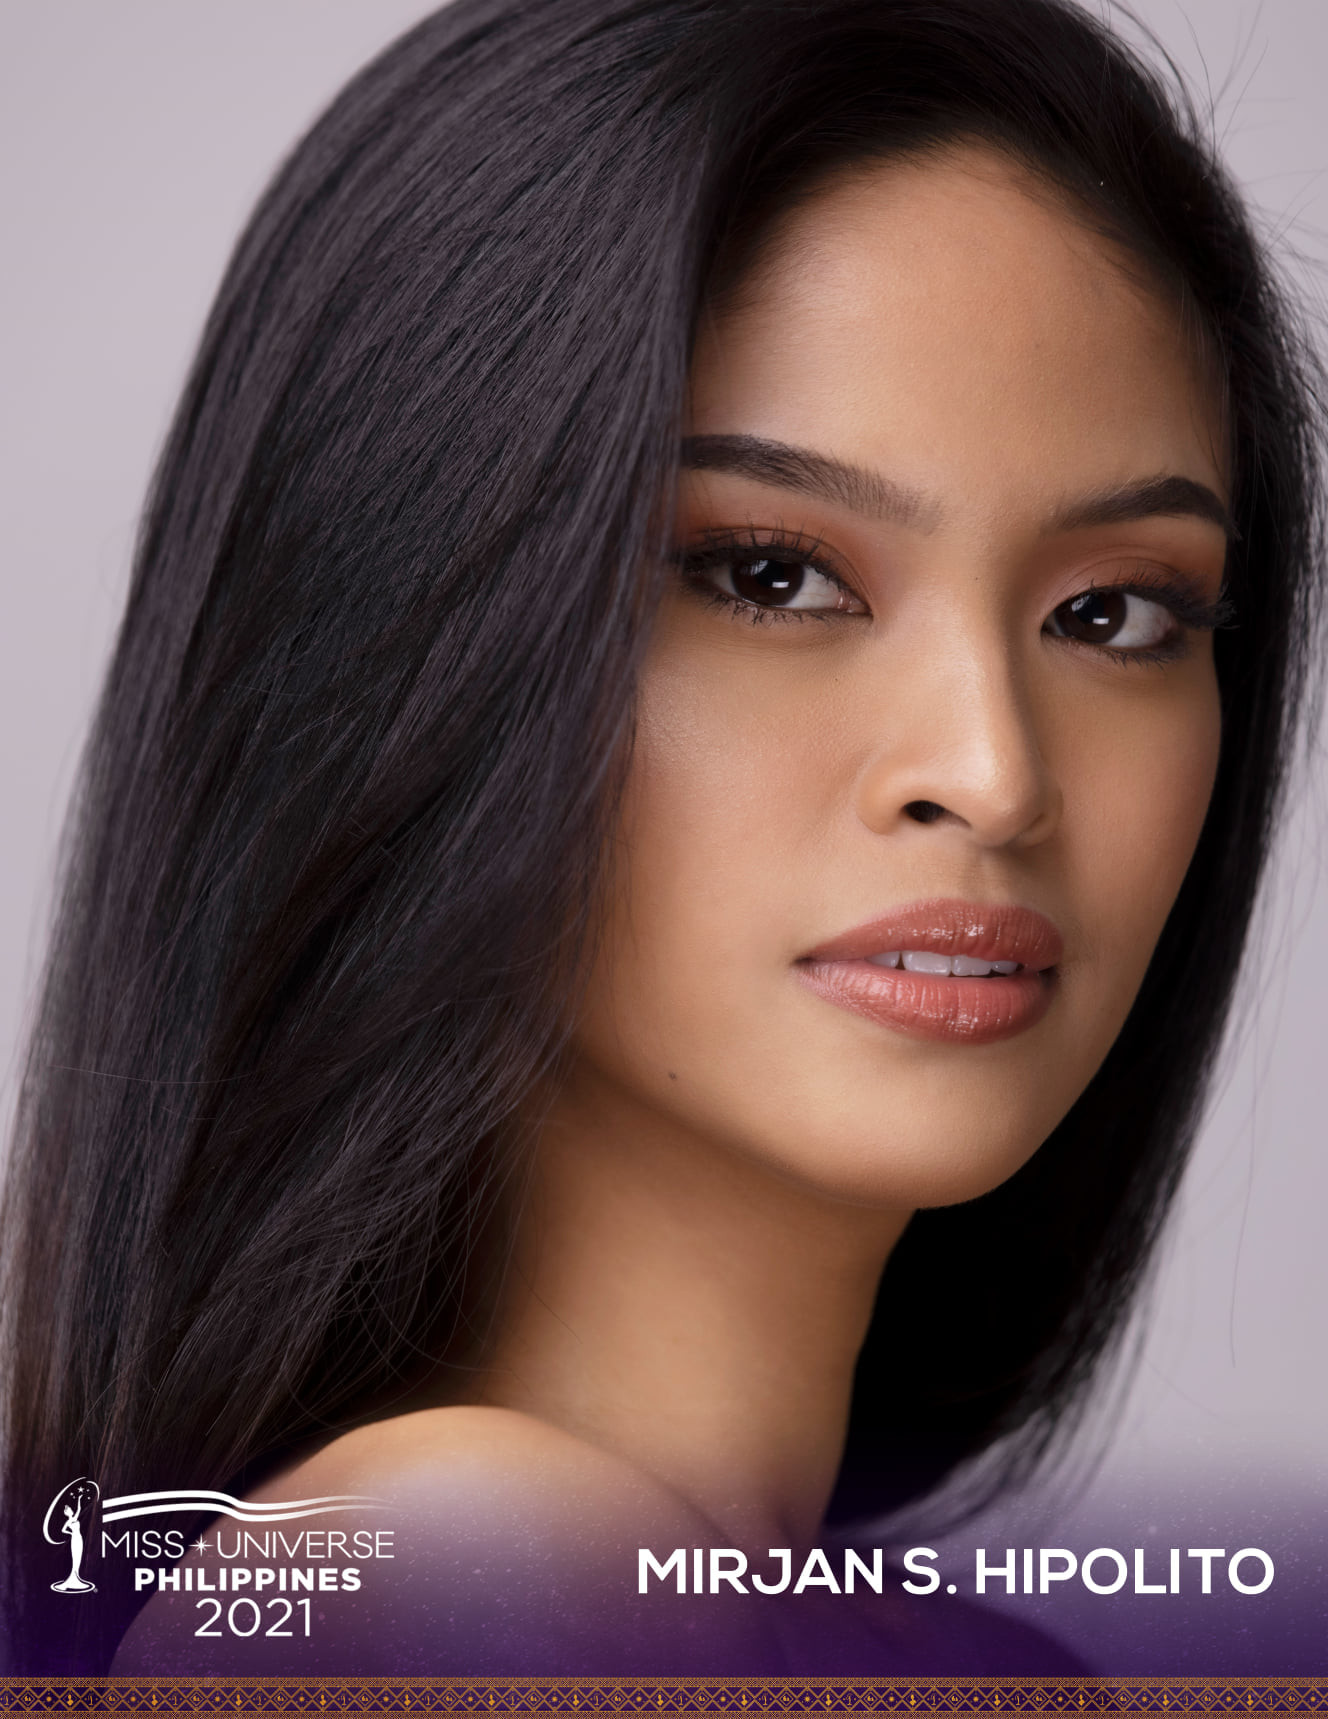 pre-candidatas a miss universe philippines 2021. - Página 4 Al7d0X